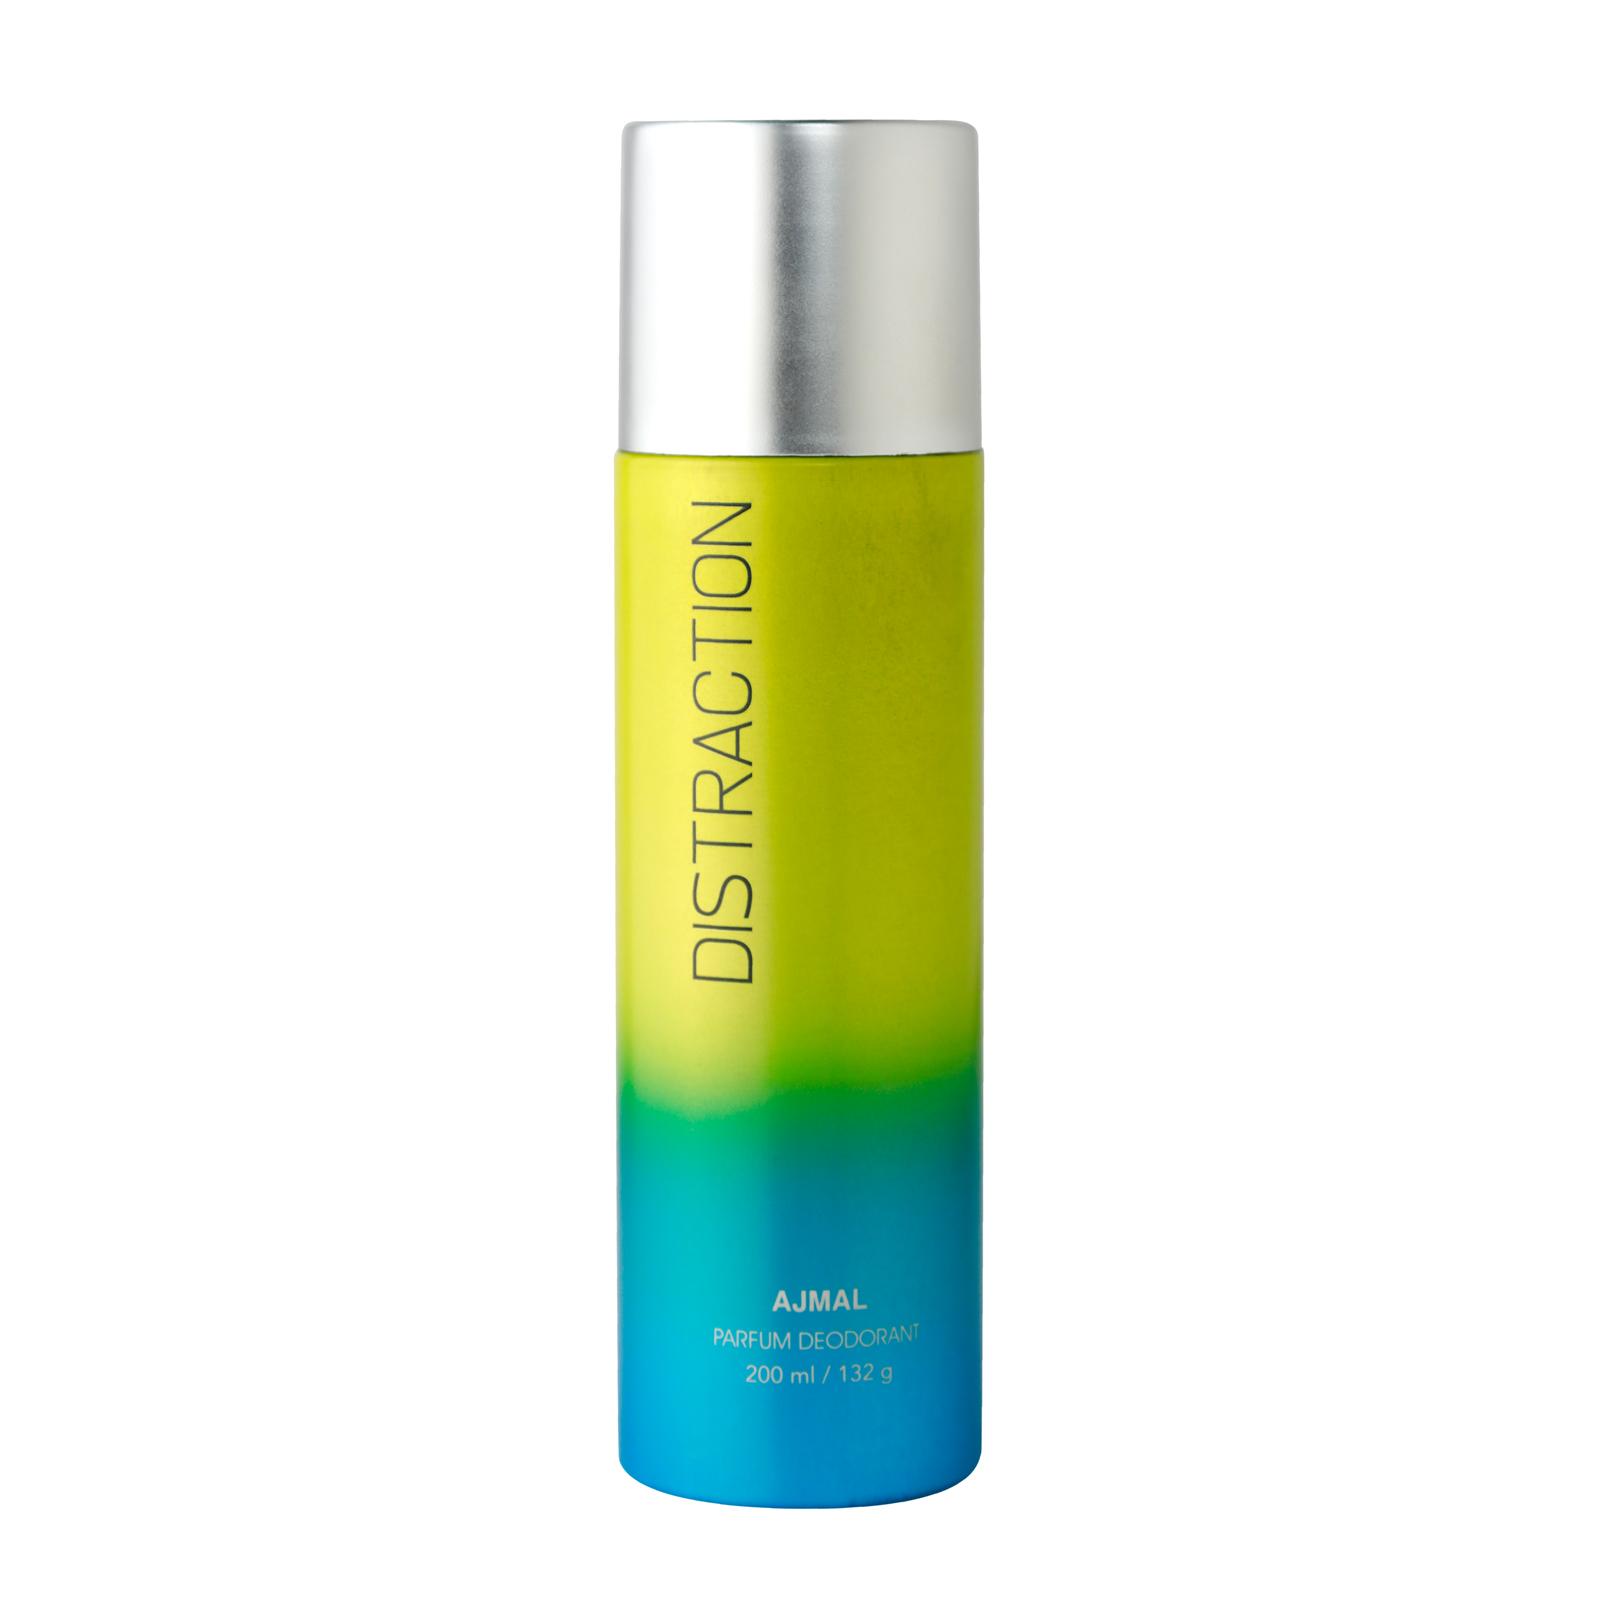 Ajmal | Ajmal Distraction Deodorant Woody Fragrance 200ml for Unisex